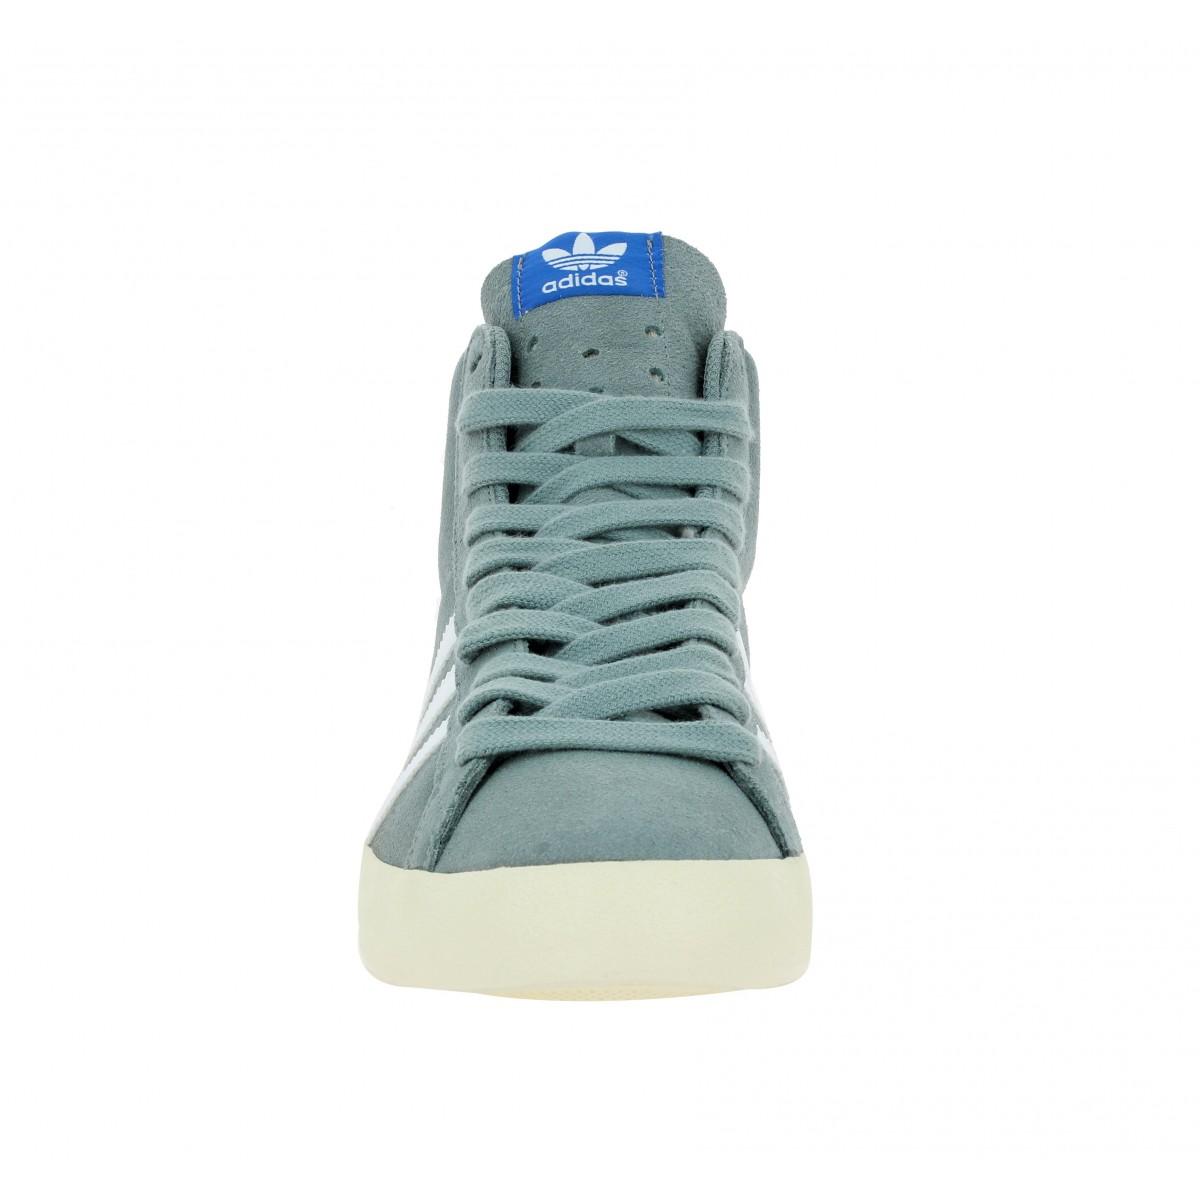 ADIDAS Basket Profi velours Homme Gris   Baskets, Adidas